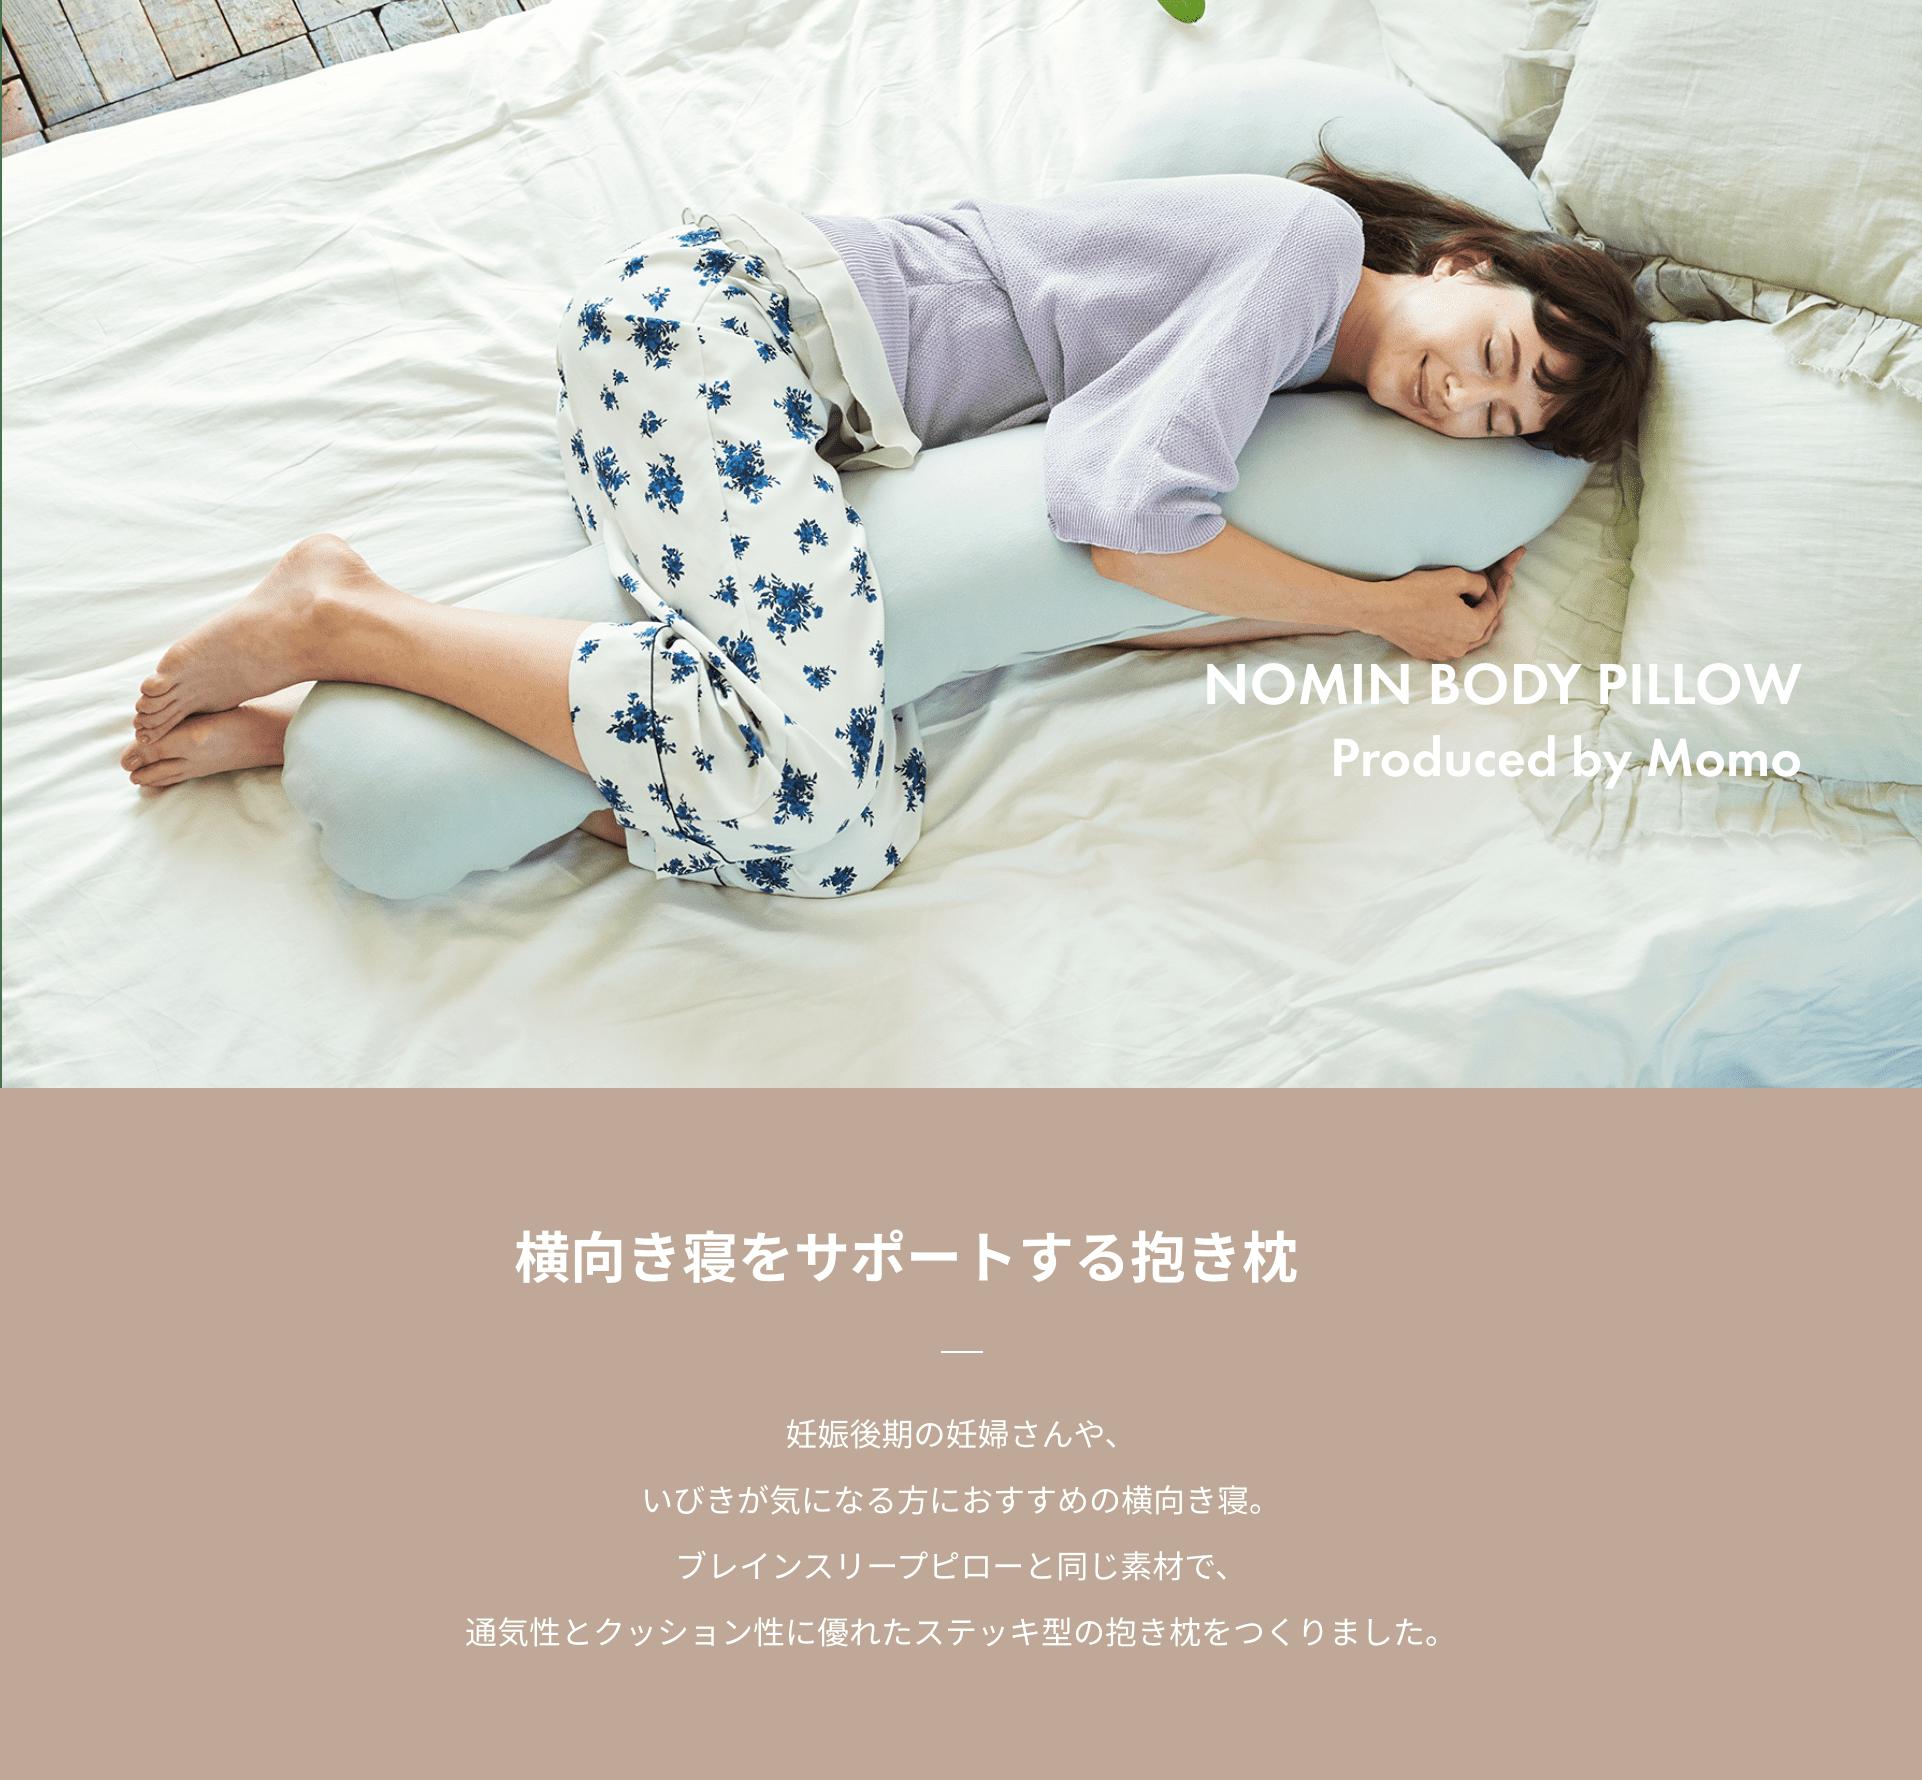 NOMIN BODY PILLOW Produced by Momo 横向き寝をサポートする抱き枕 妊娠後期の妊婦さんや、いびきが気になる方におすすめの横向き寝。ブレインスリープピローと同じ素材で、通気性とクッション性に優れたステッキ型の抱き枕をつくりました。